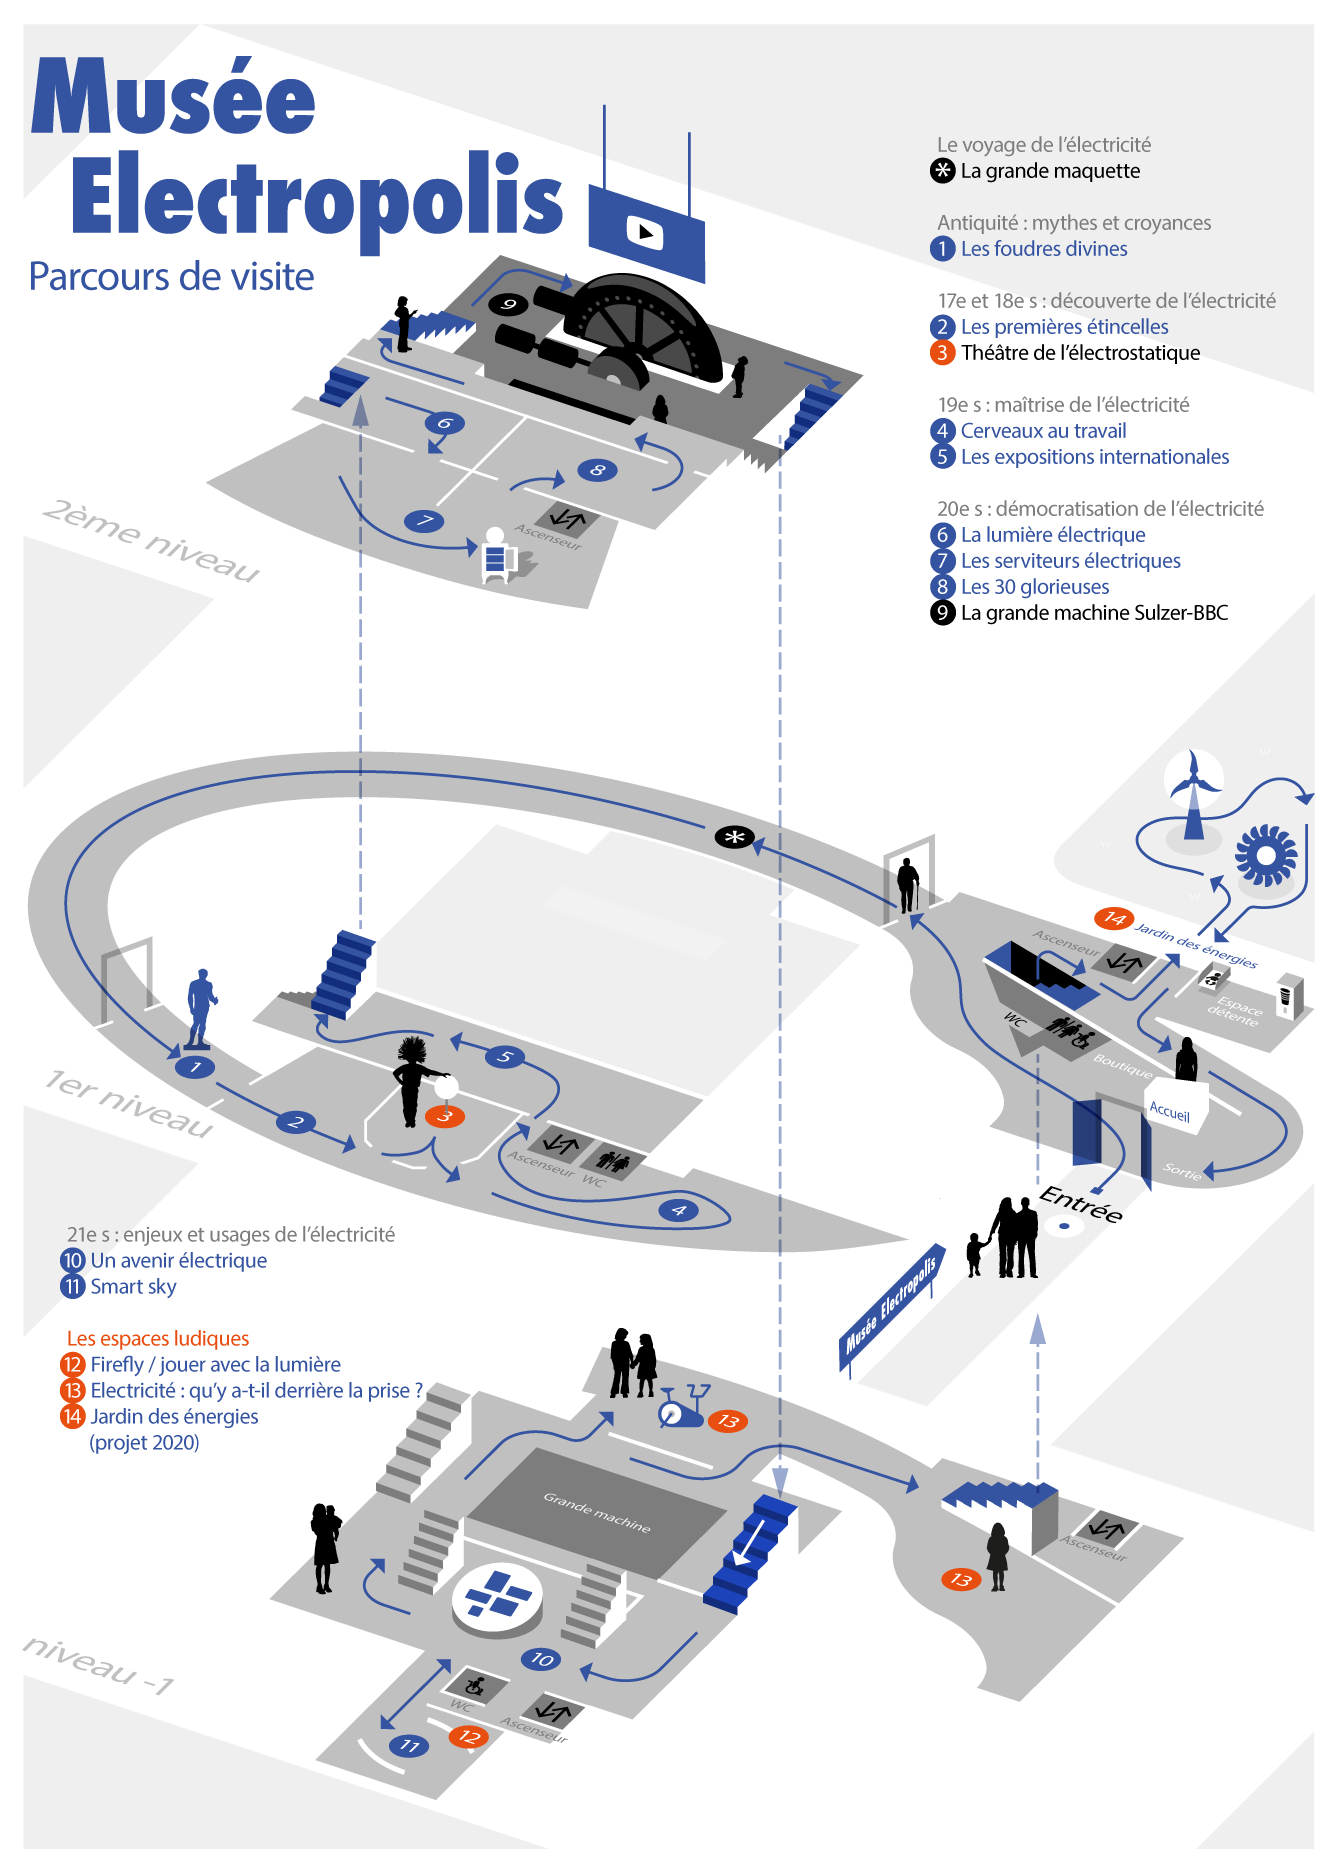 tino-tinoland-electropolis-museum-plan